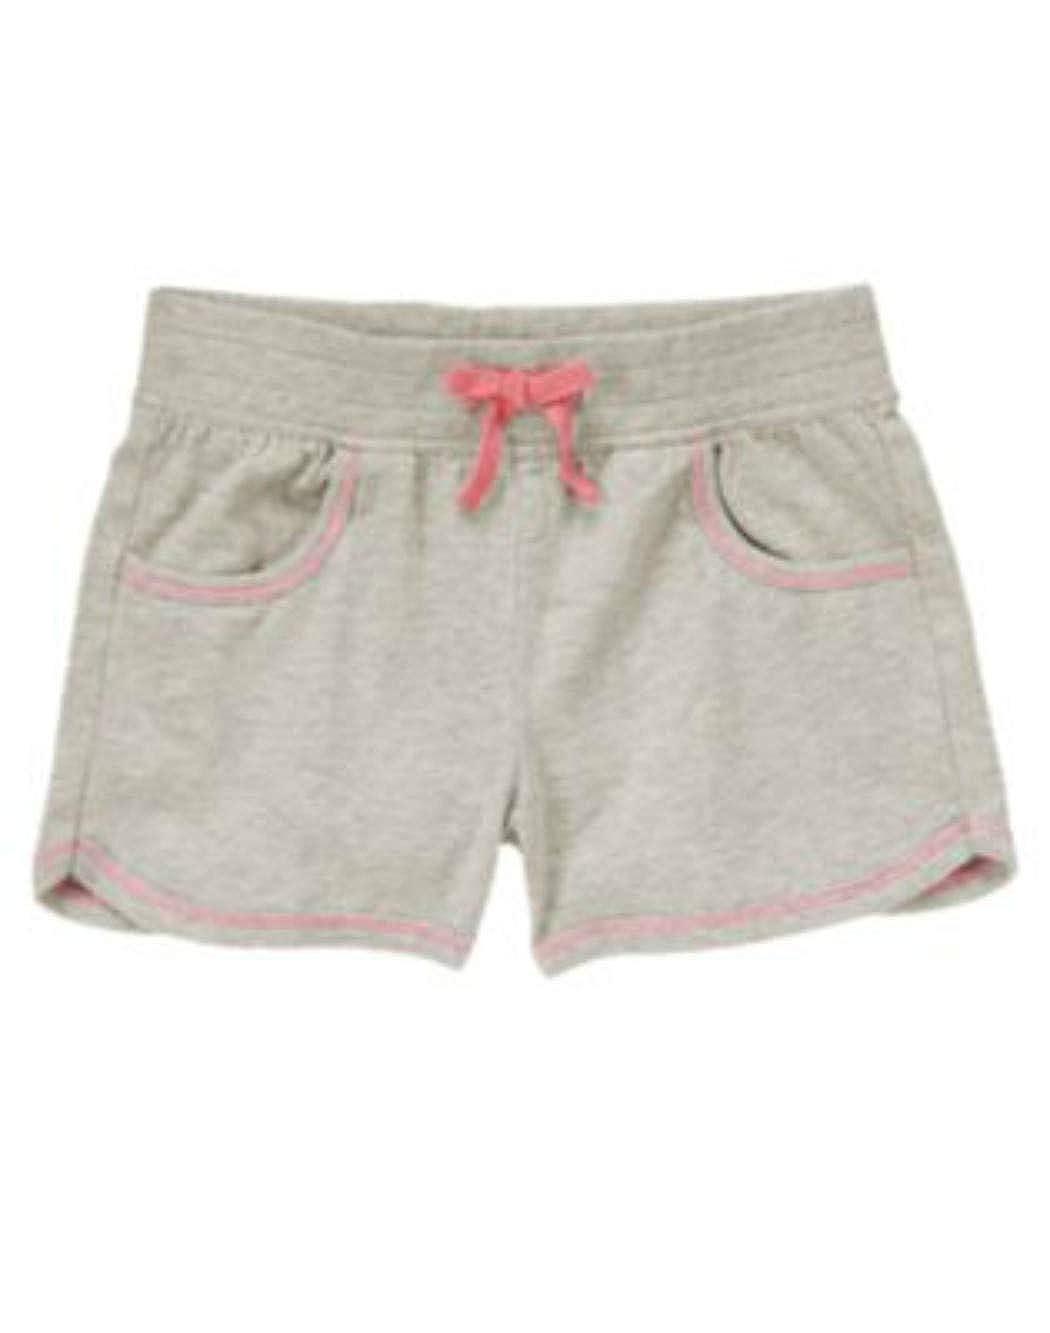 Heather Gray Crazy8 Girls Slubbed Essential Shorts Sz S 5-6